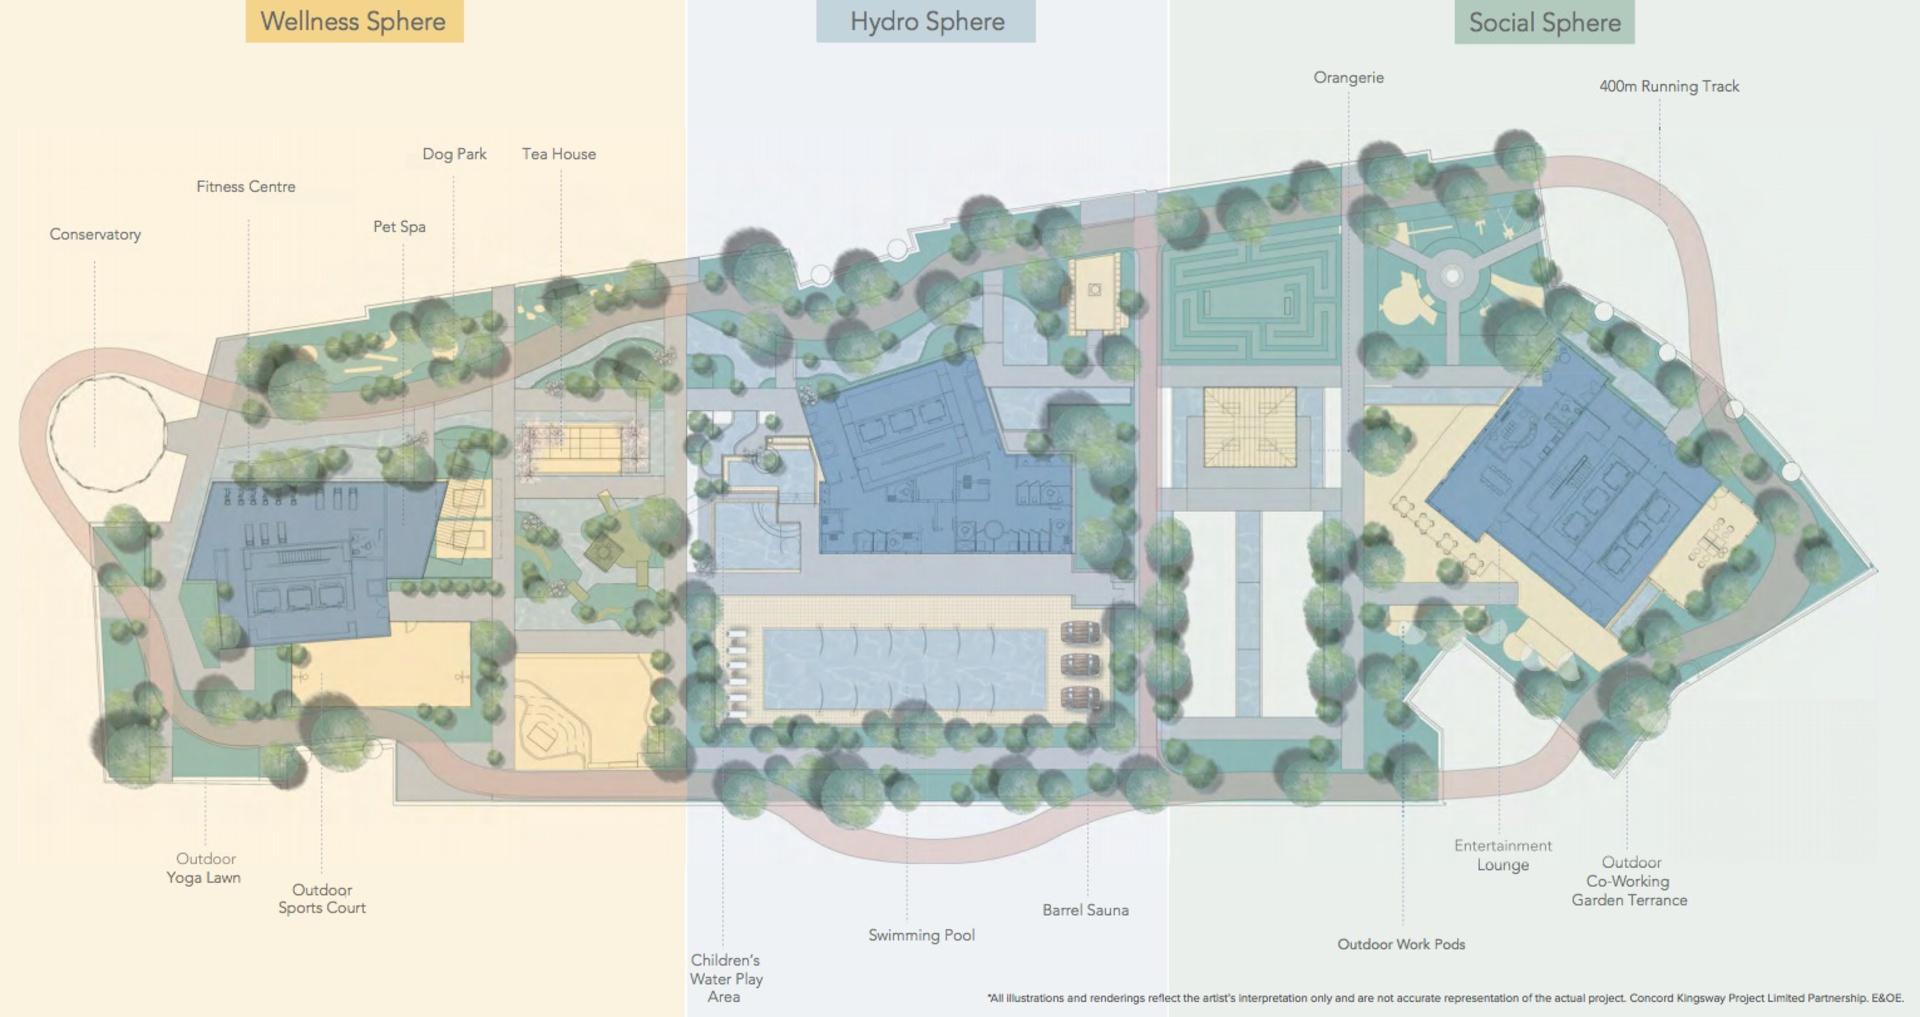 concord-metrotown-spheres-plan at Concord Metrotown (4750 Kingsway, Metrotown, Burnaby South)